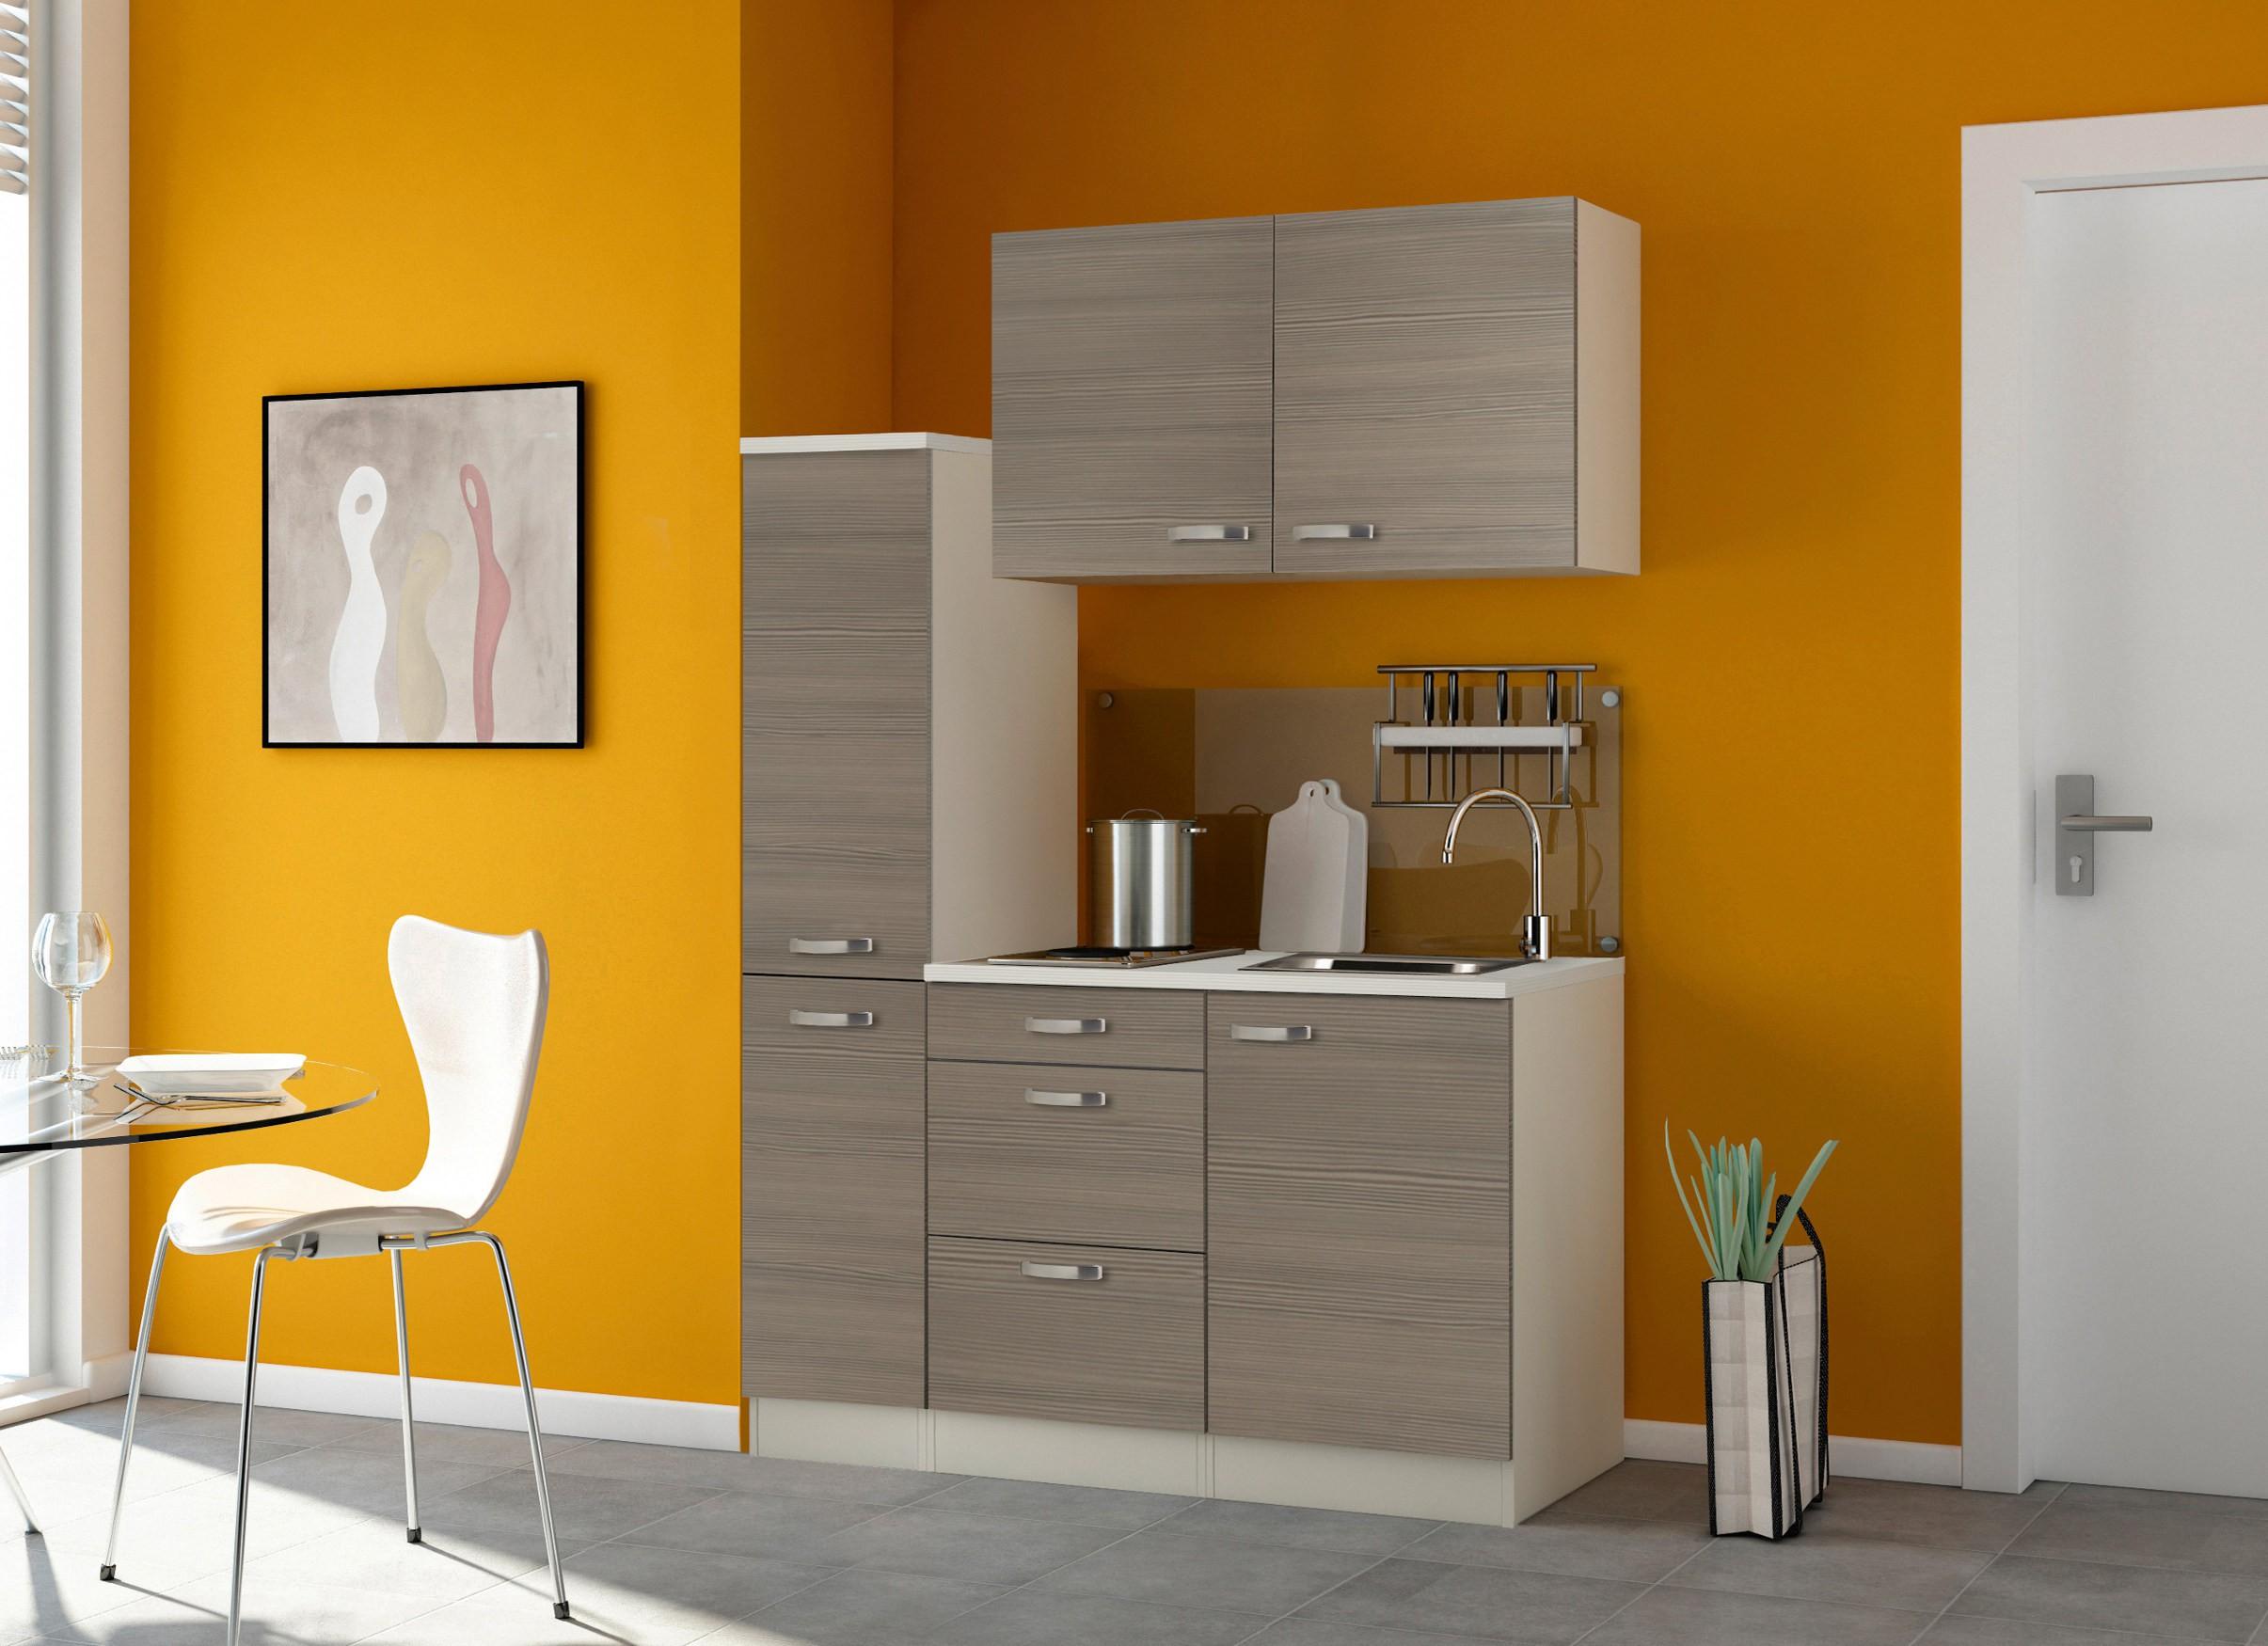 singlek che toledo mit elektro kochfeld breite 130 cm pinie nougat k che singlek chen. Black Bedroom Furniture Sets. Home Design Ideas